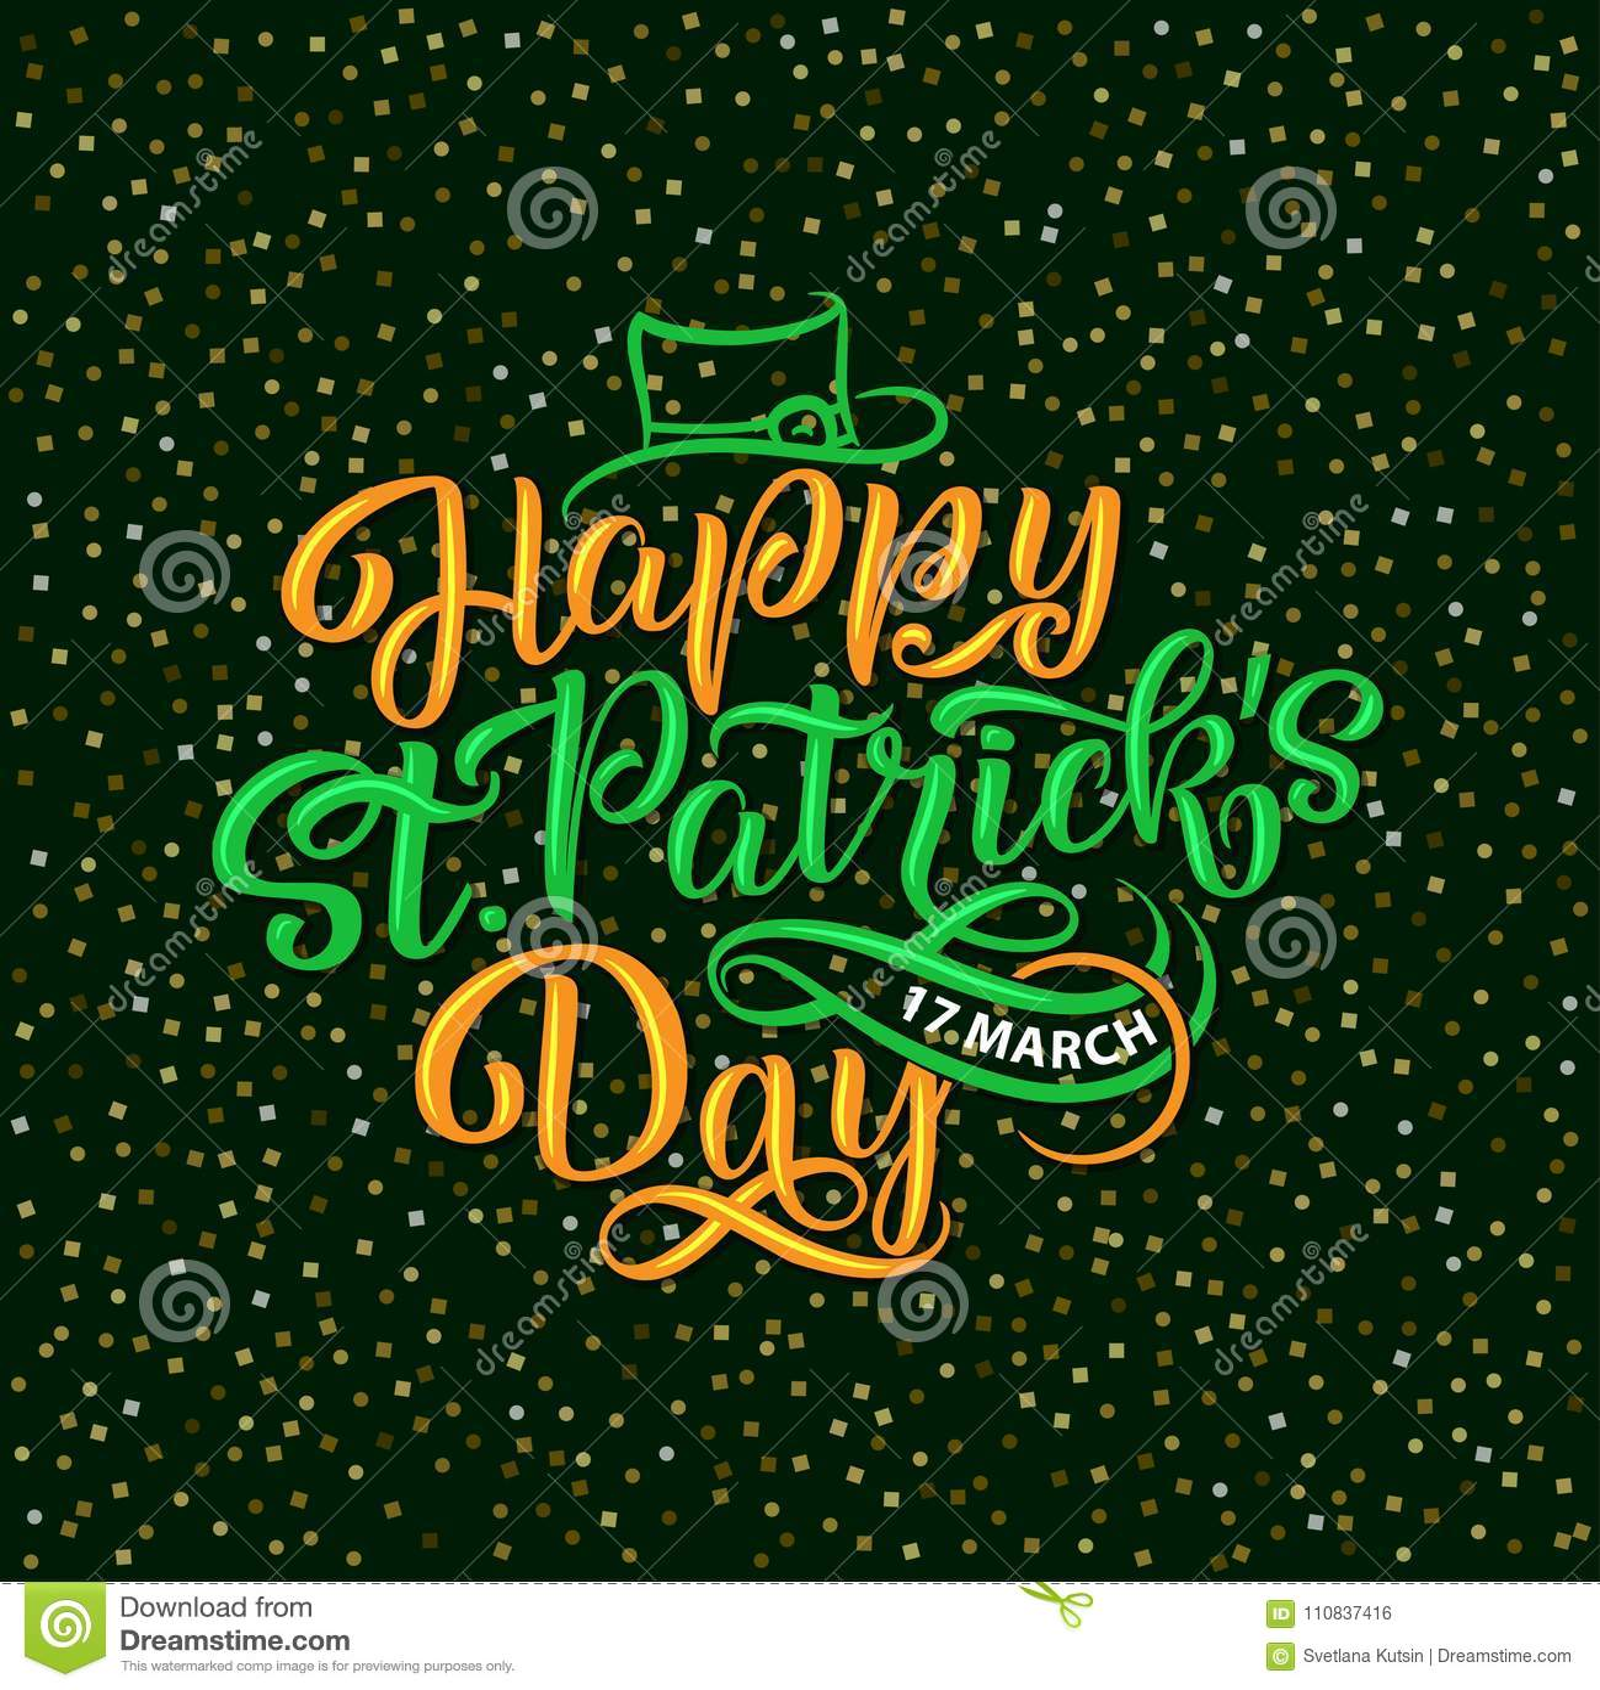 Vector Illustration Of Happy Saint Patrick S Day Logotype Hand Sketched Irish Celebration Design